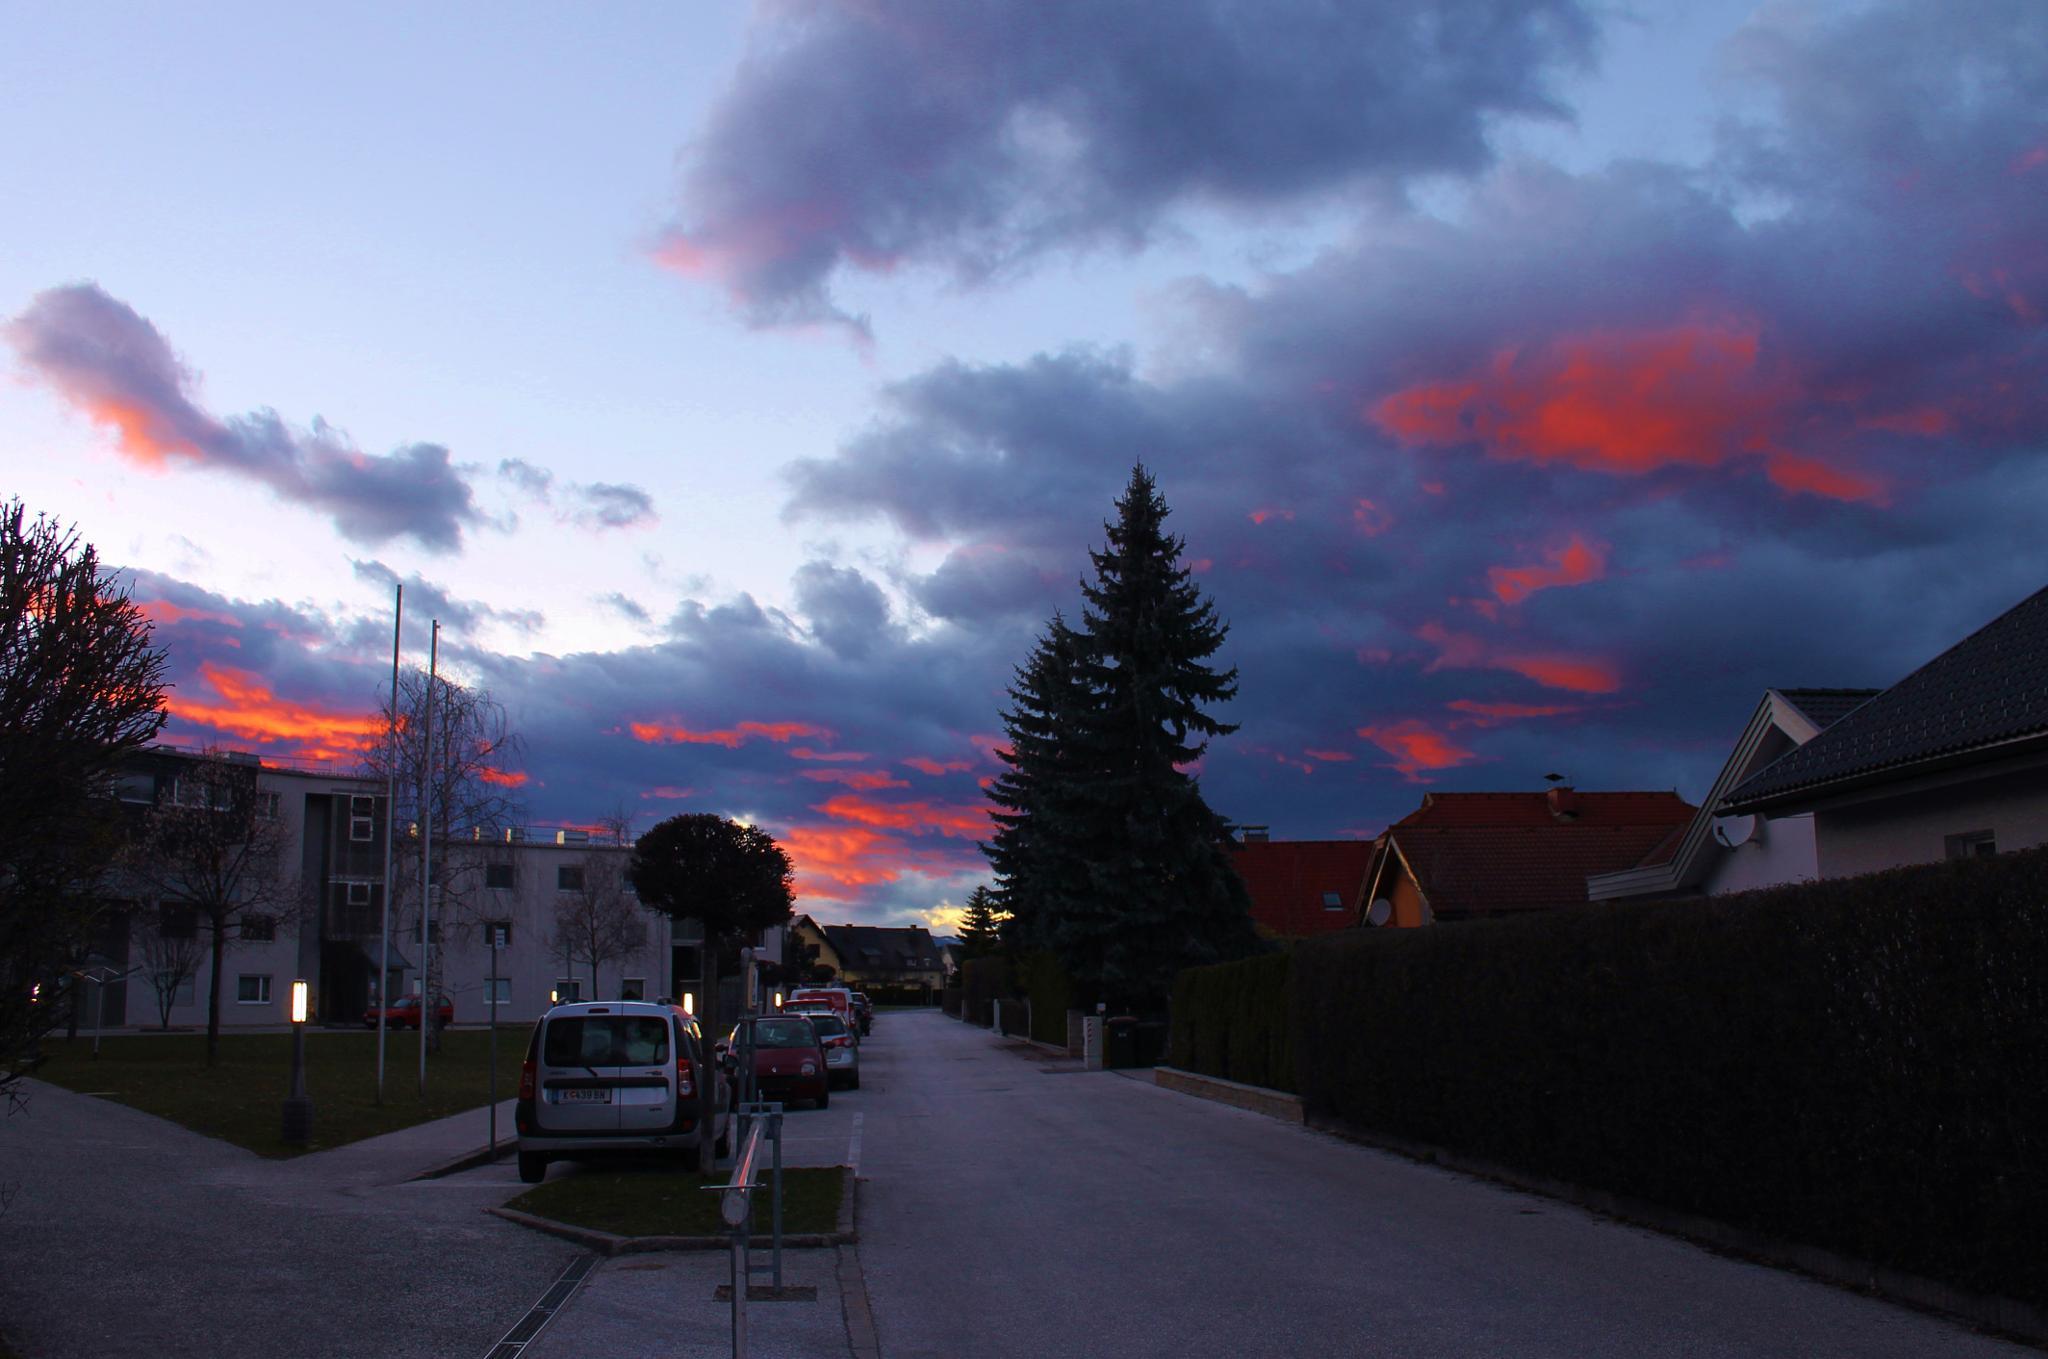 Tramonto in città by meiferdinando